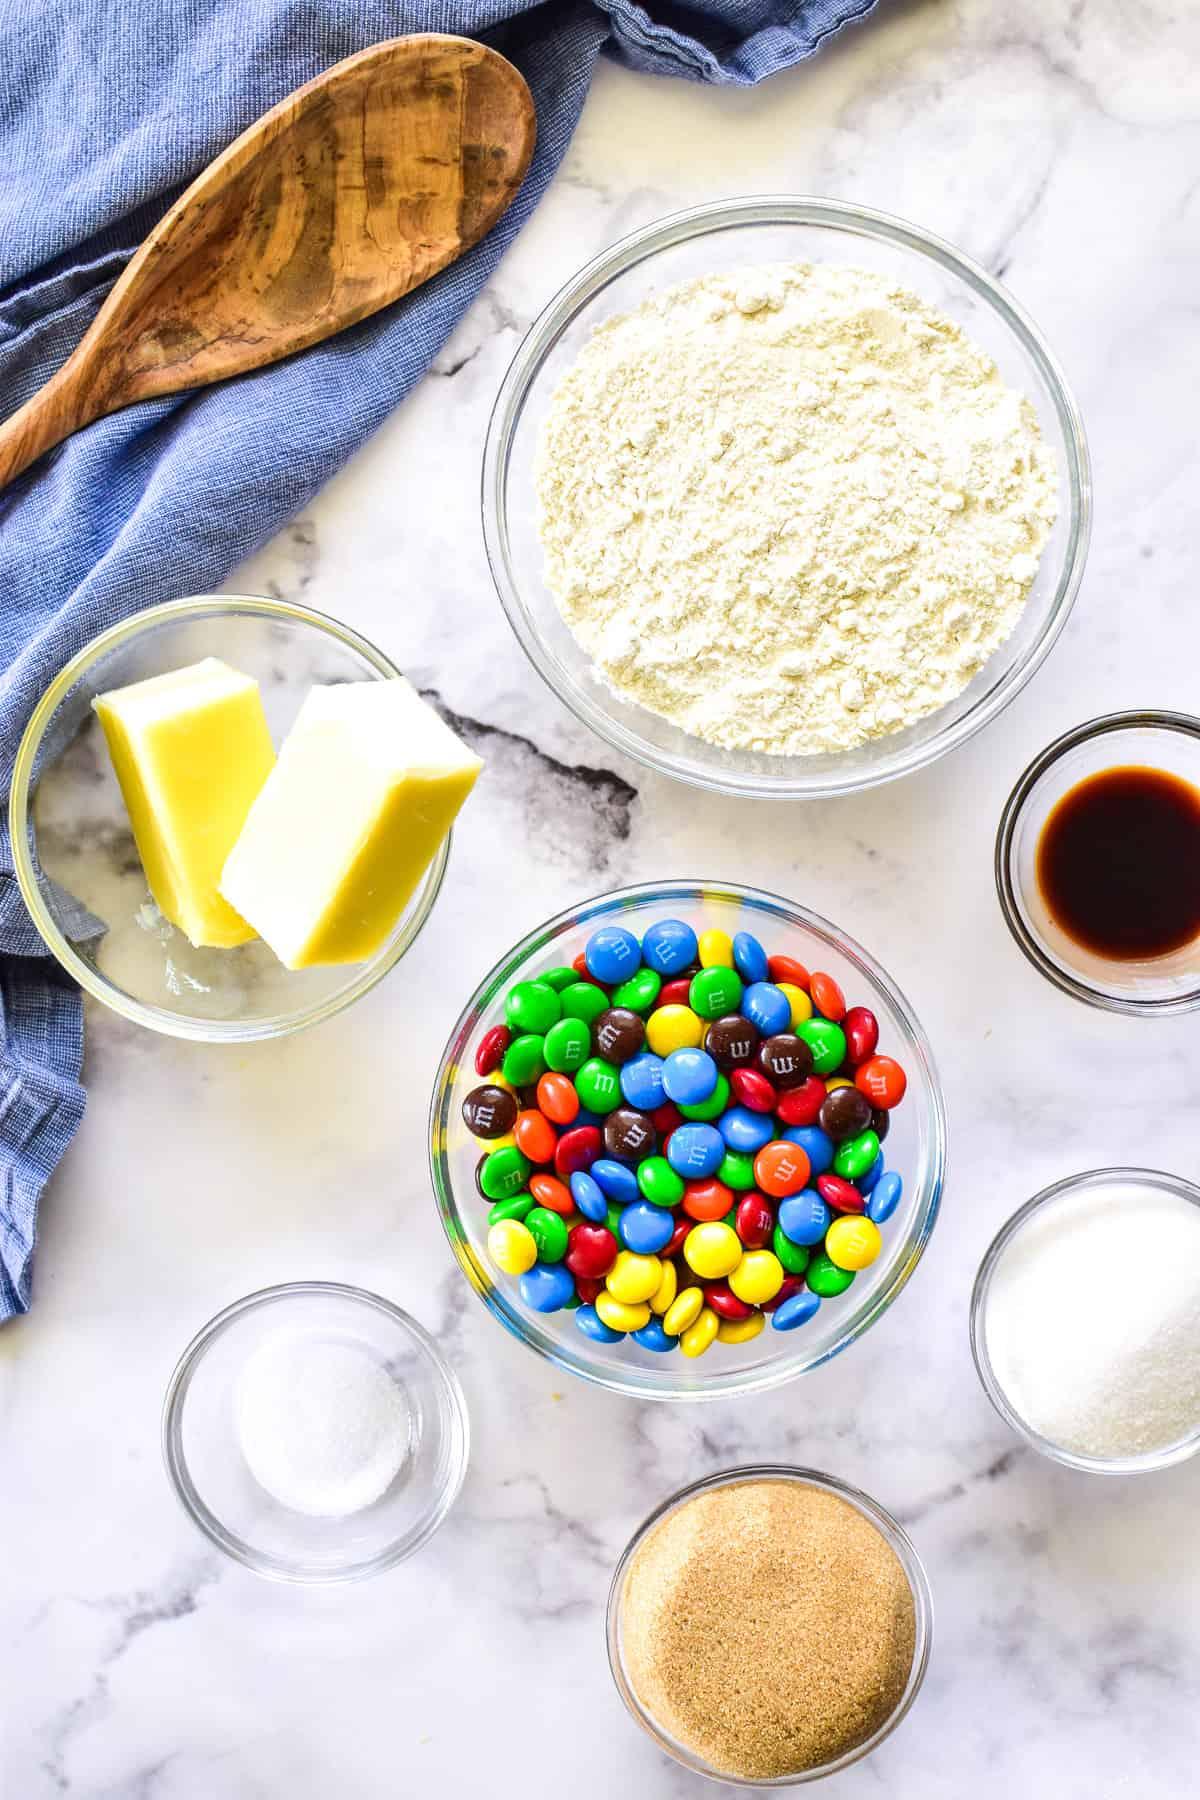 Edible Cookie Dough ingredients in bowls